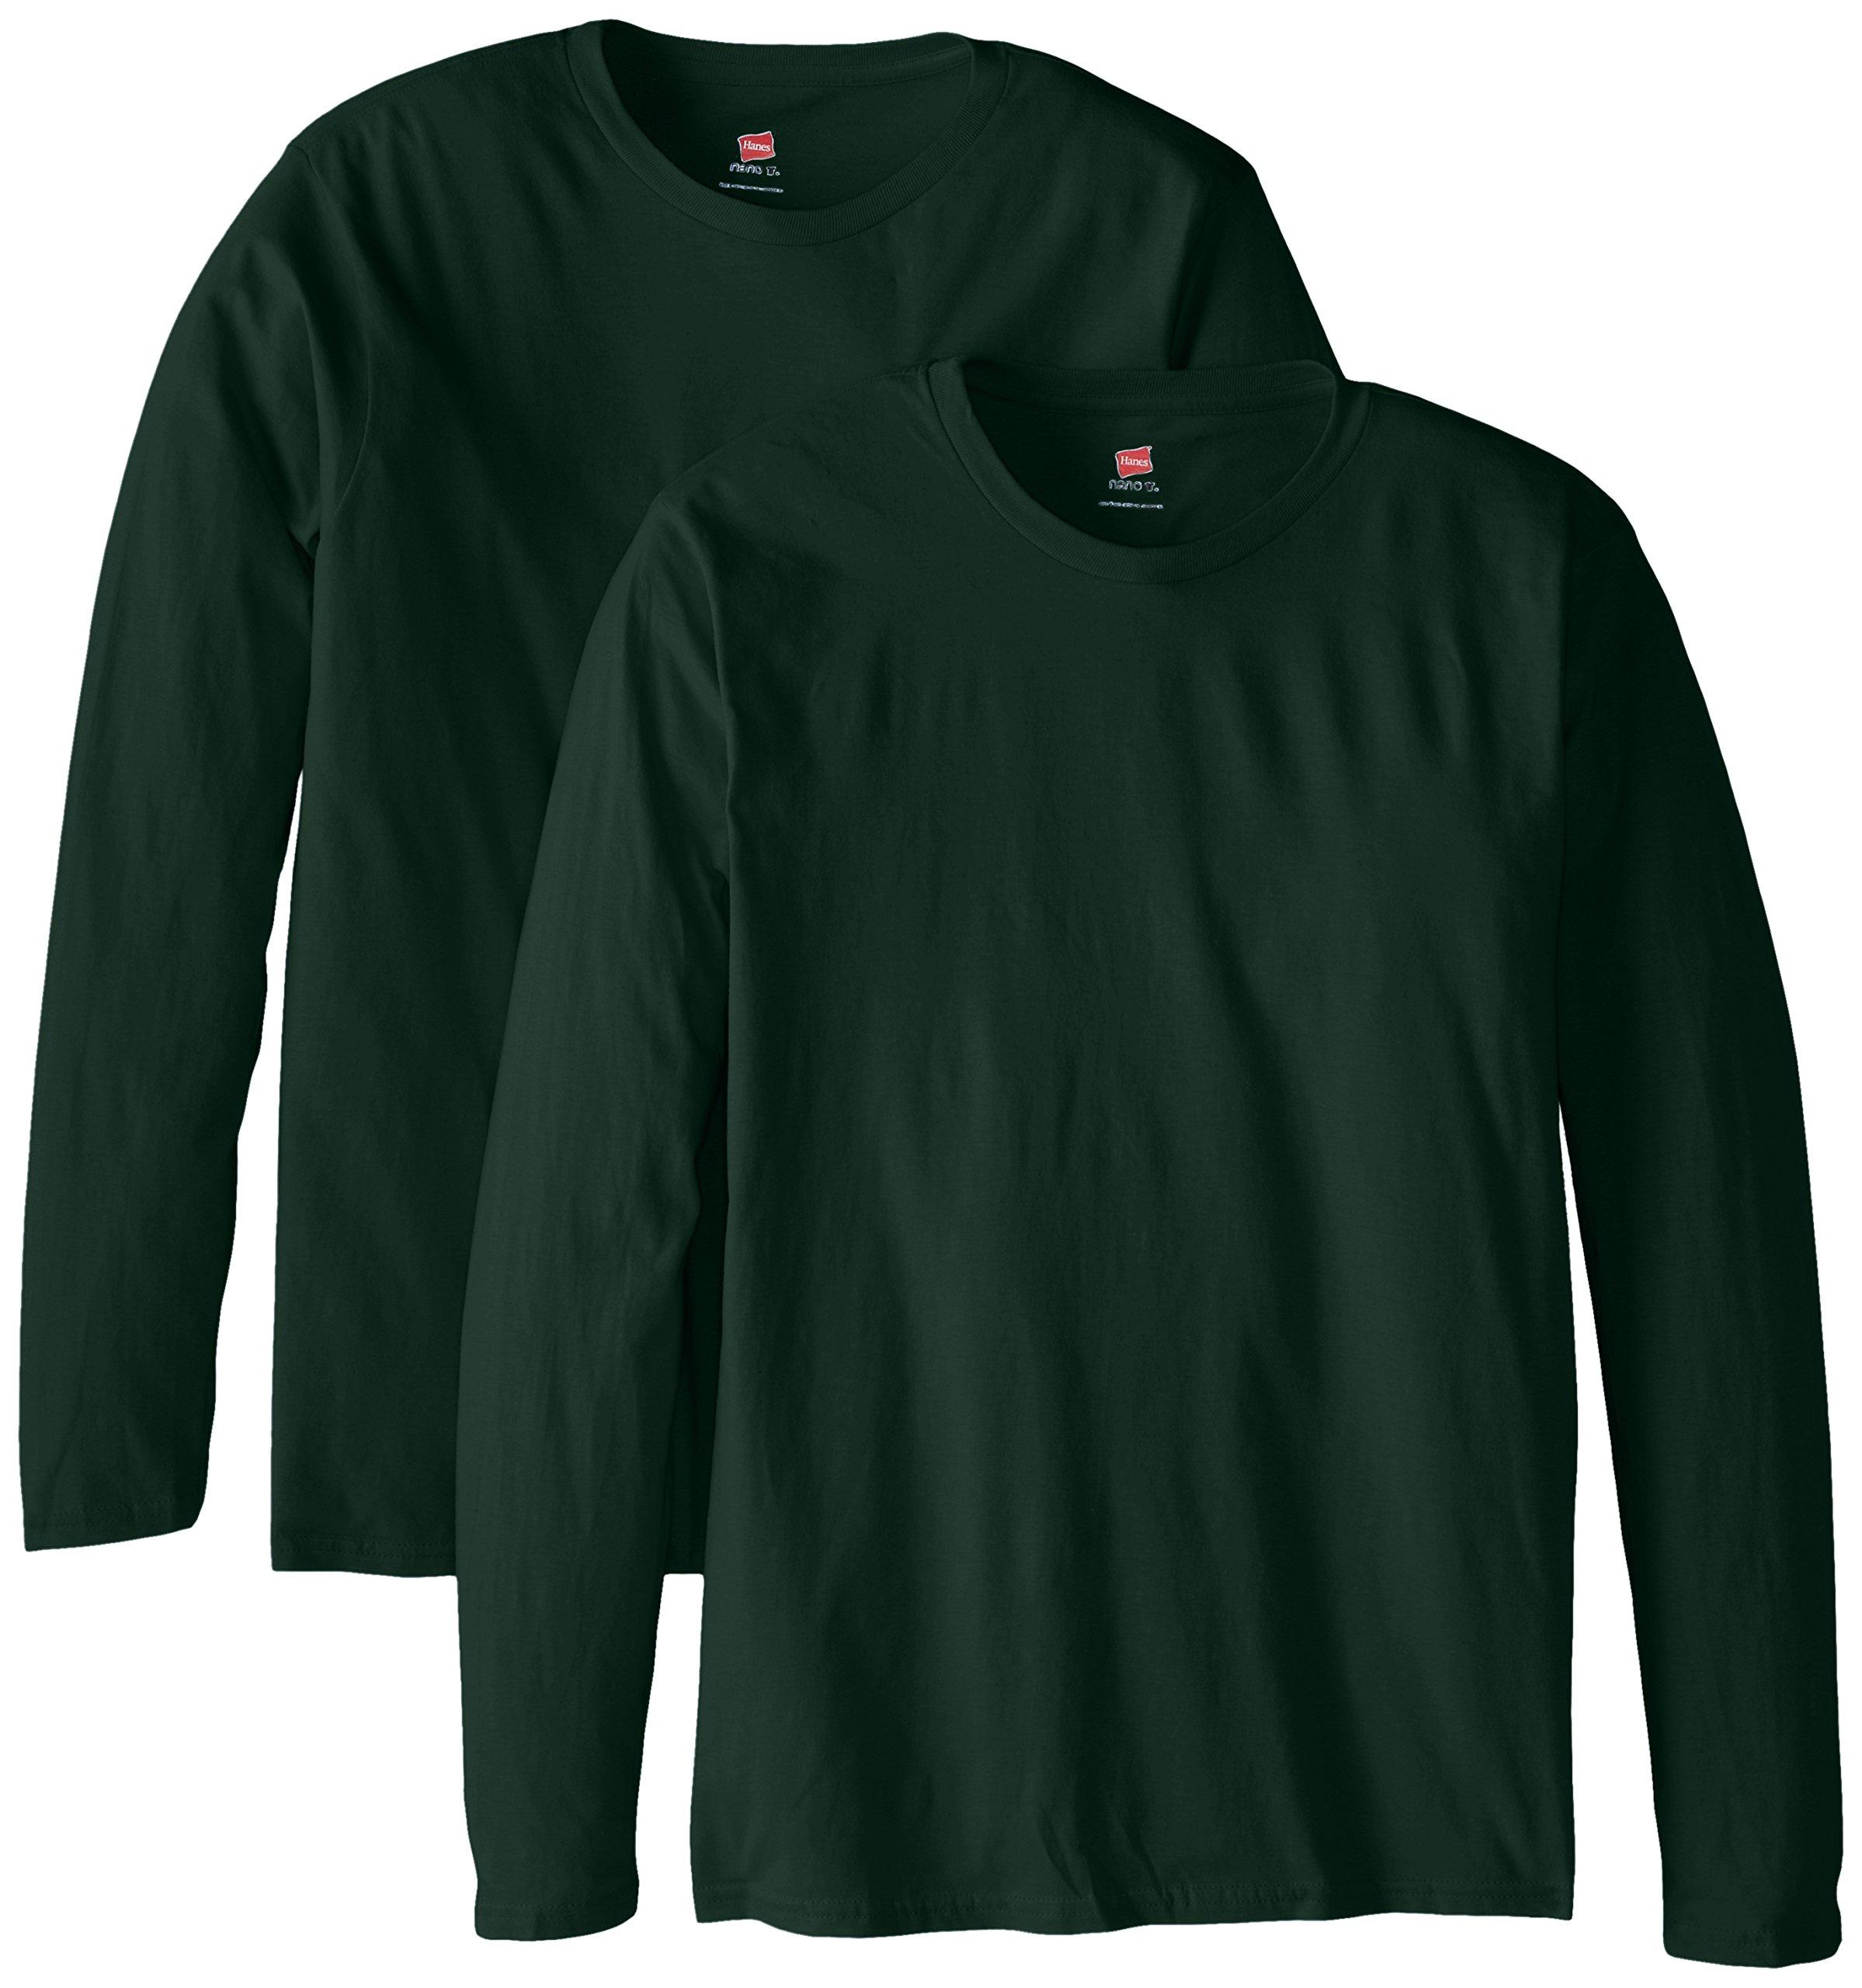 Hanes Men's Long Sleeve Nano Cotton Premium T-Shirt (Pack of 2), Deep Forest, Large